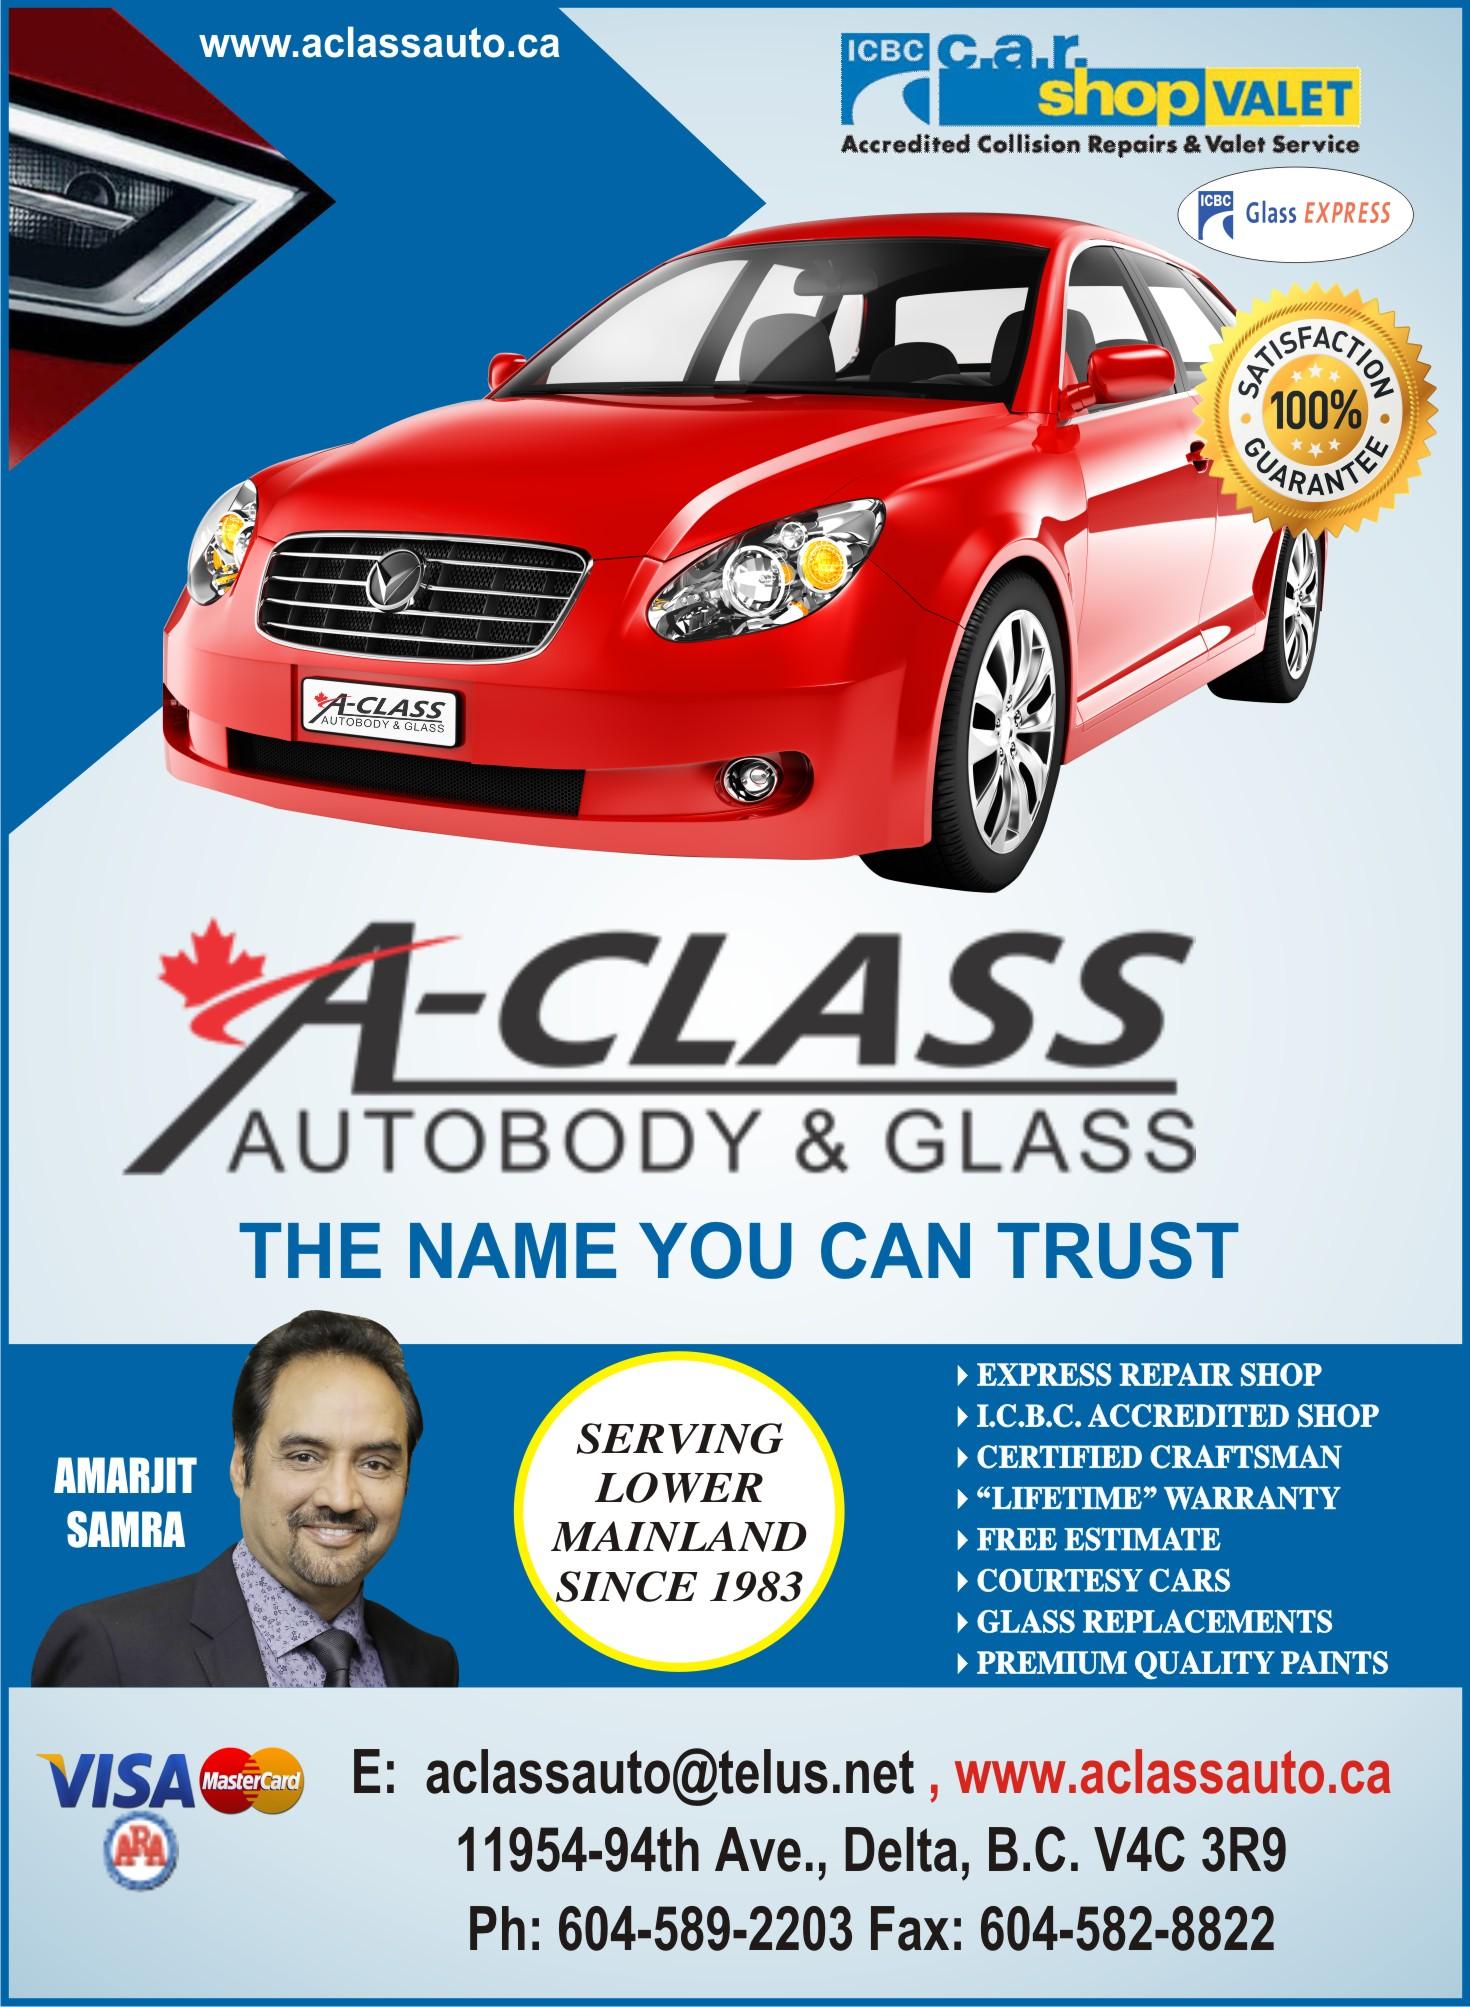 A-Class Autobody & Glass